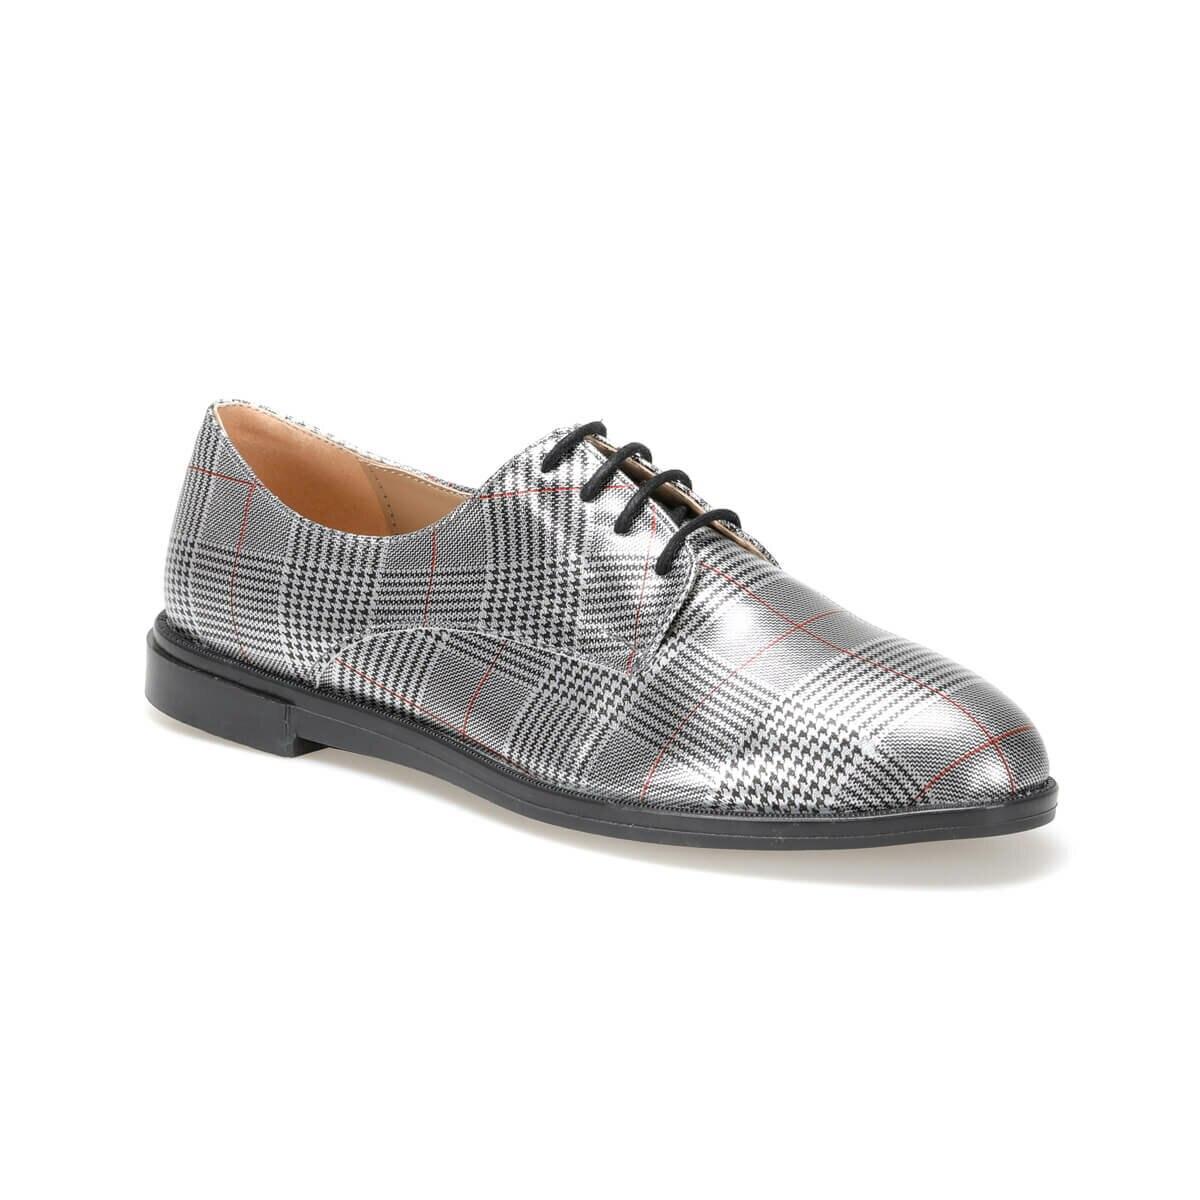 FLO CRABBE01Z PATENT LEATHER Gray Women 'S Oxford Shoes BUTIGO